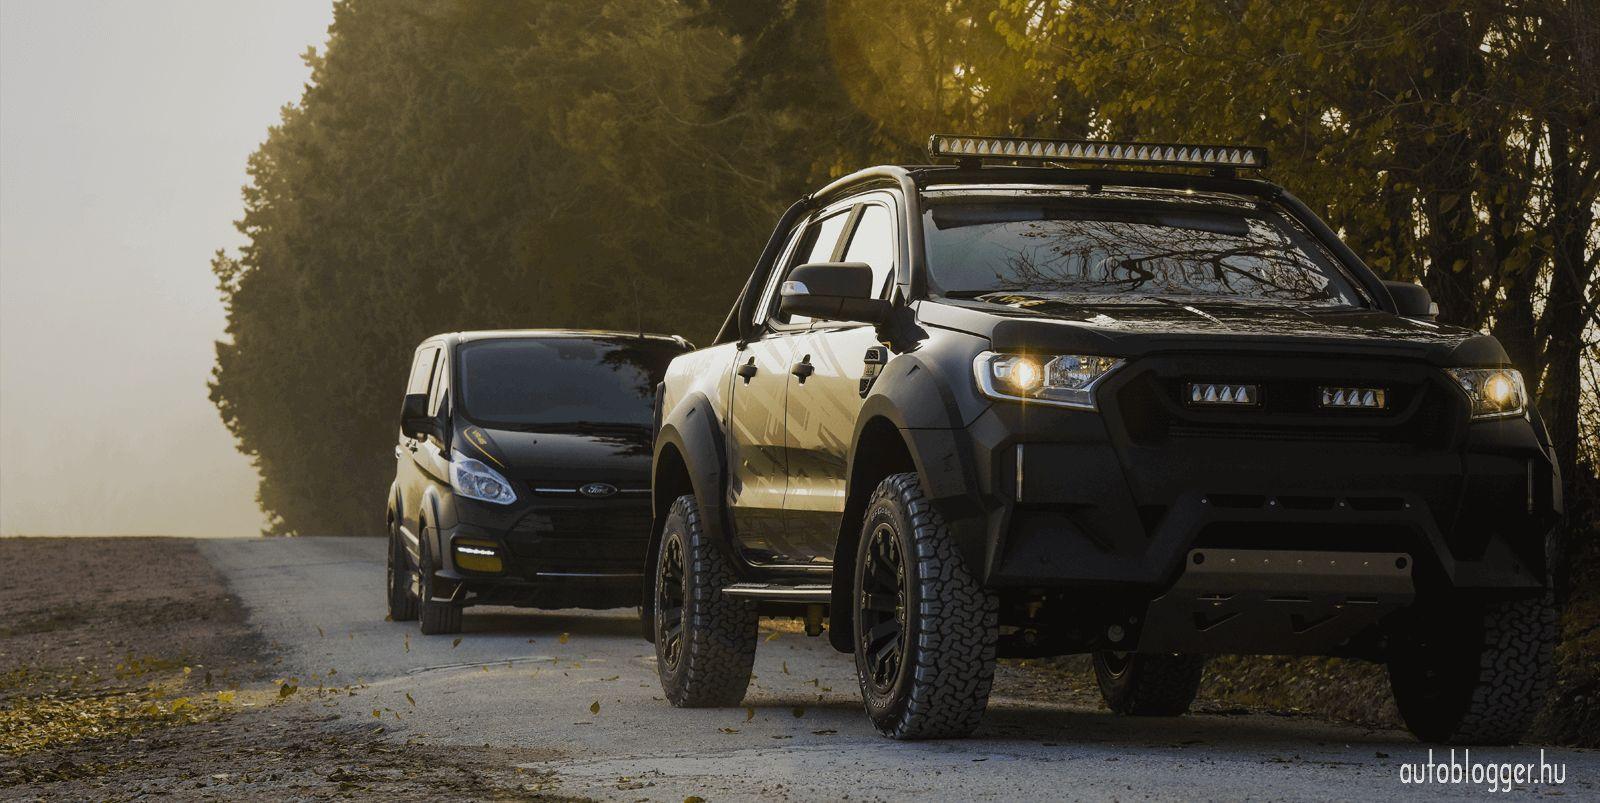 Ford-vr46--ranger_Autoblogger.hu_0010